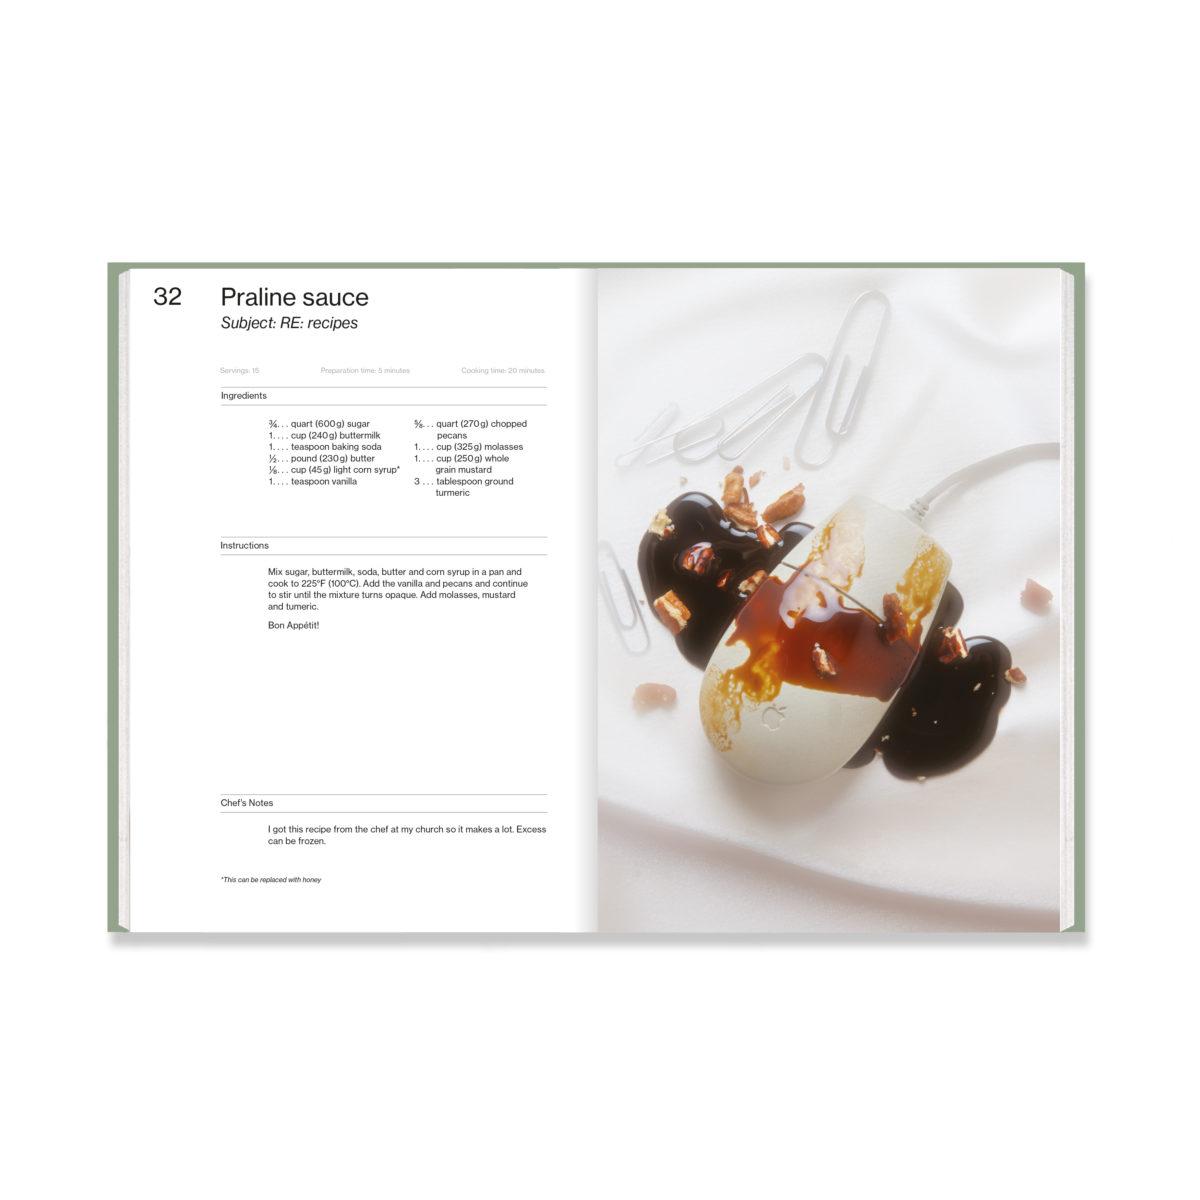 02_Leaked-Recipes-Cookbook_spread01